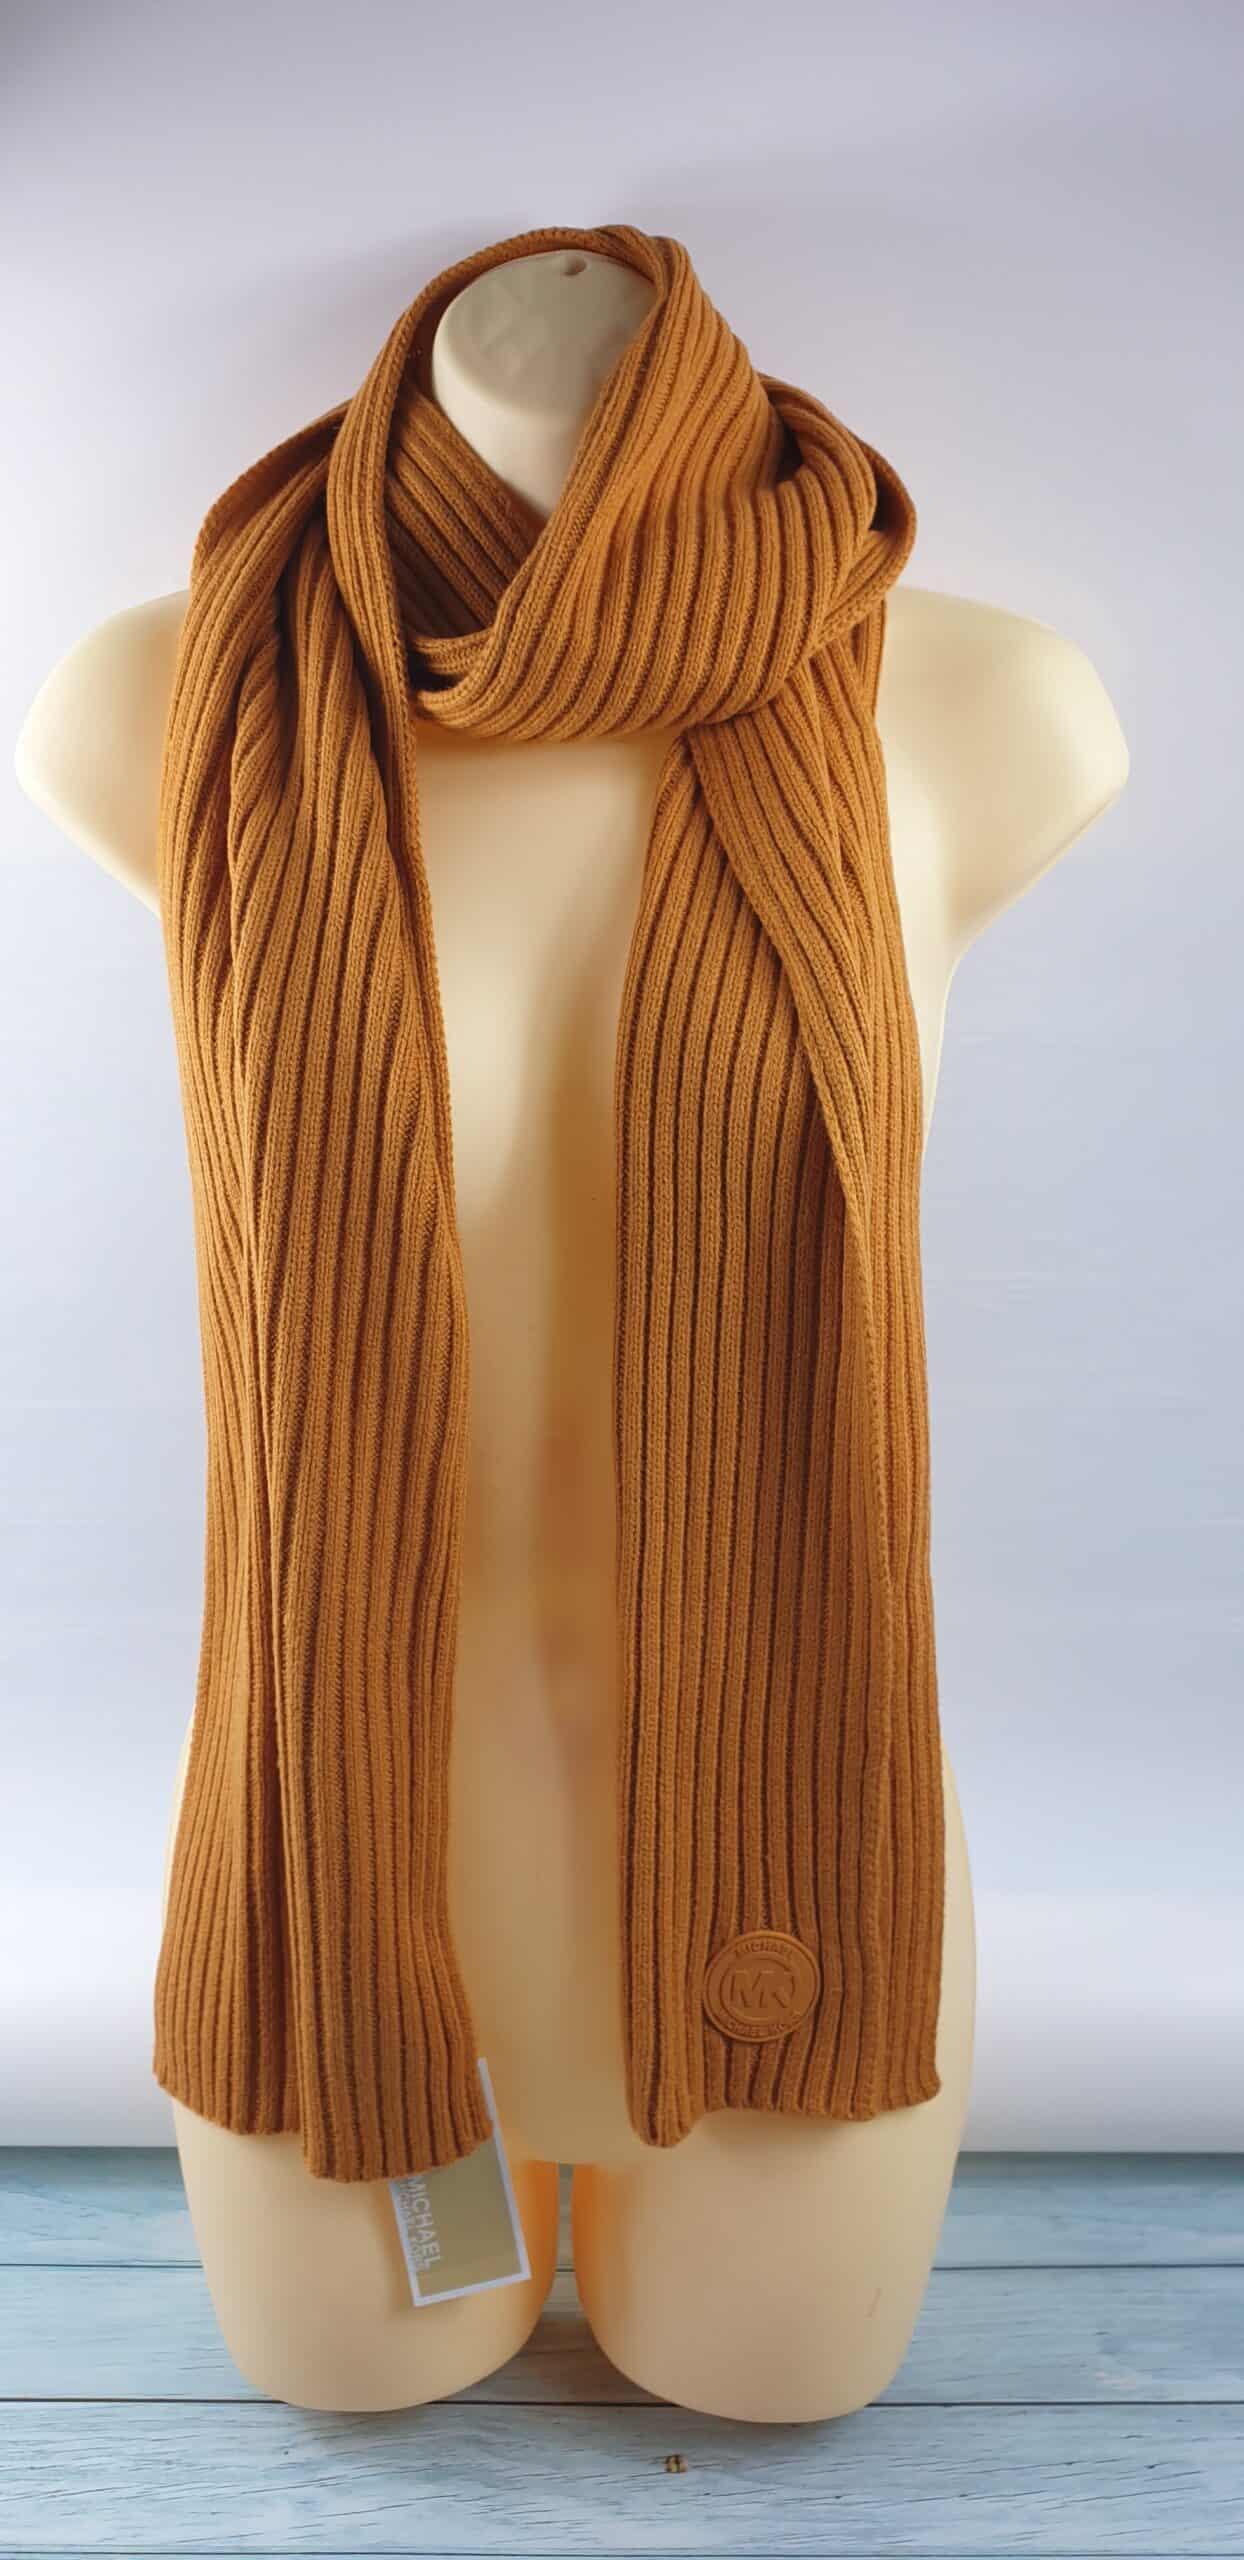 Michael Kors Scarf Knit Muffler Scarf Brand New Designer Scarf Winter Look Ebay